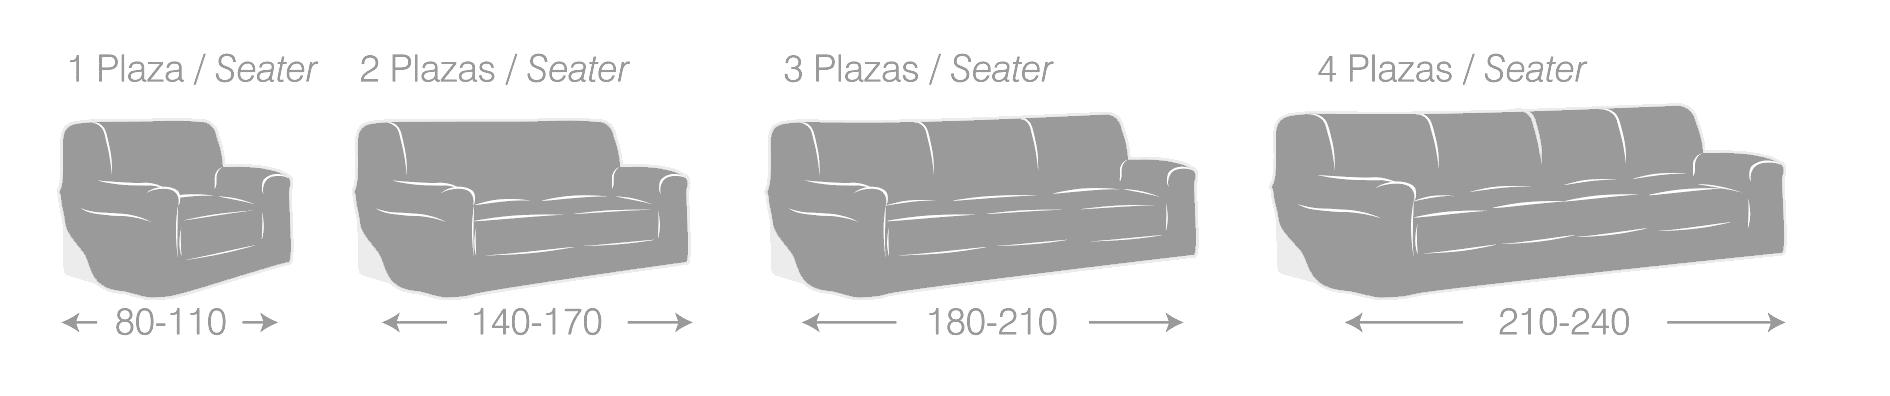 Medidas Fundas de sofás de 1 a 4 plazas